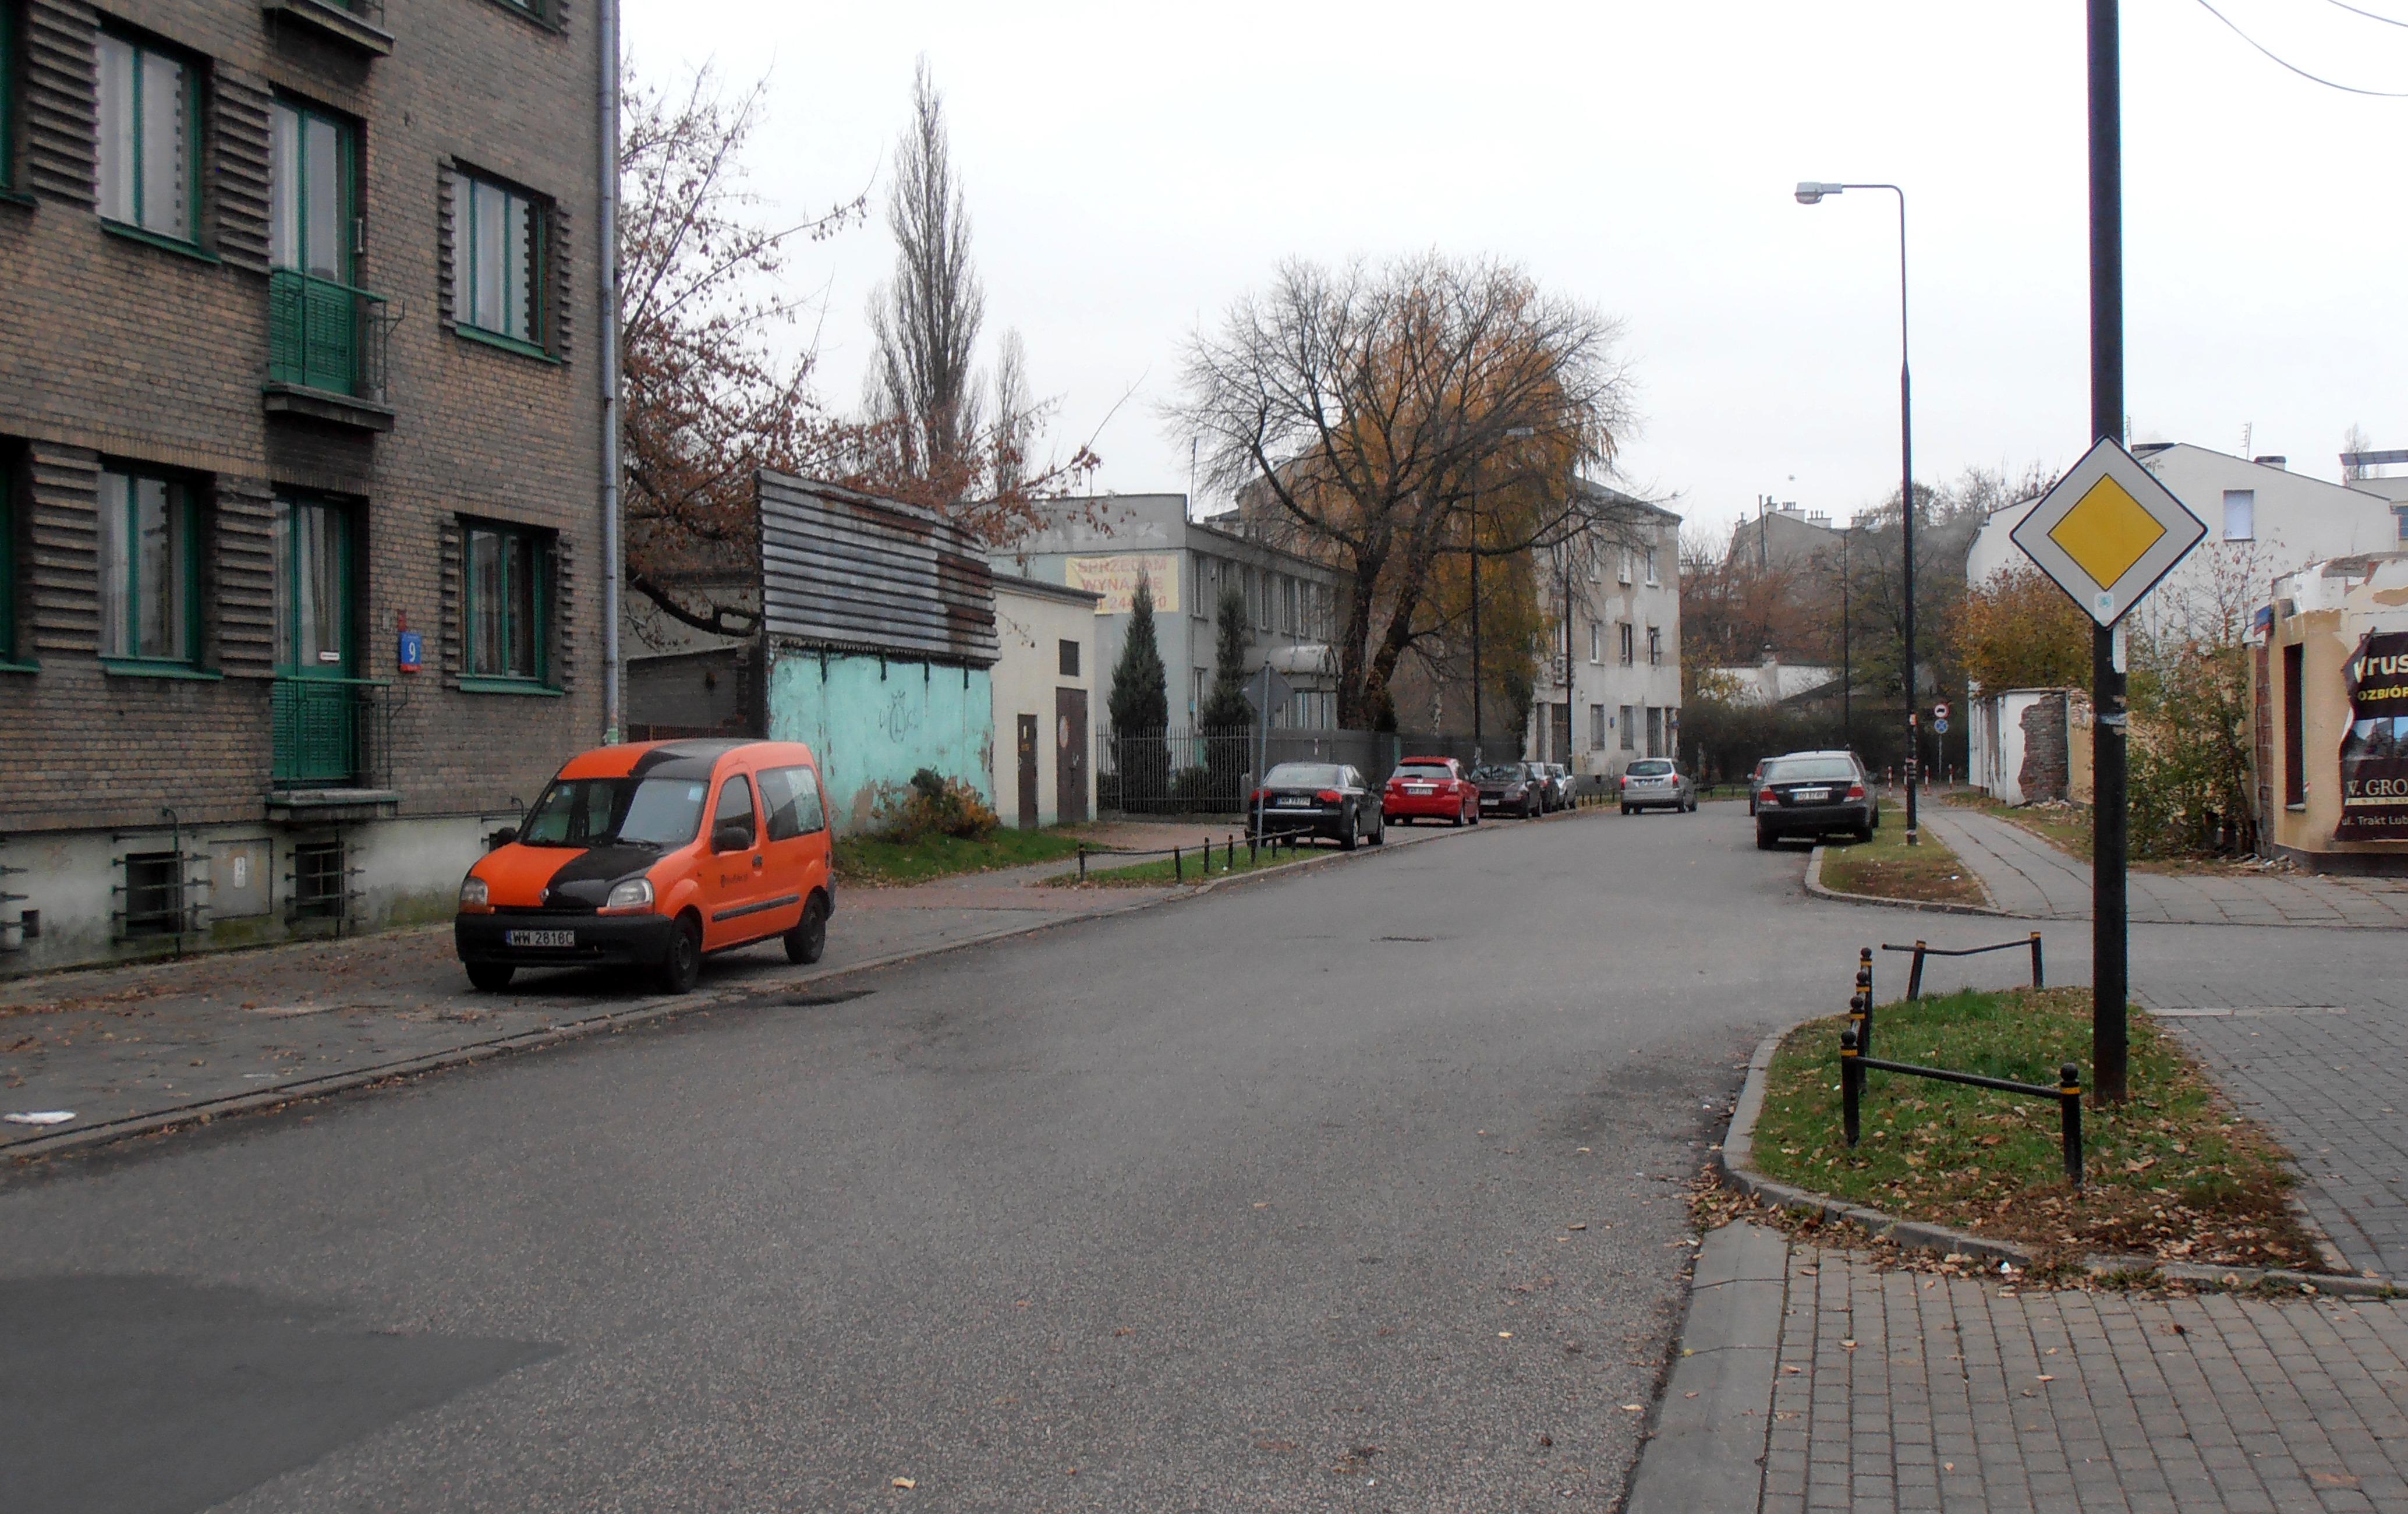 Ulica Groszowicka